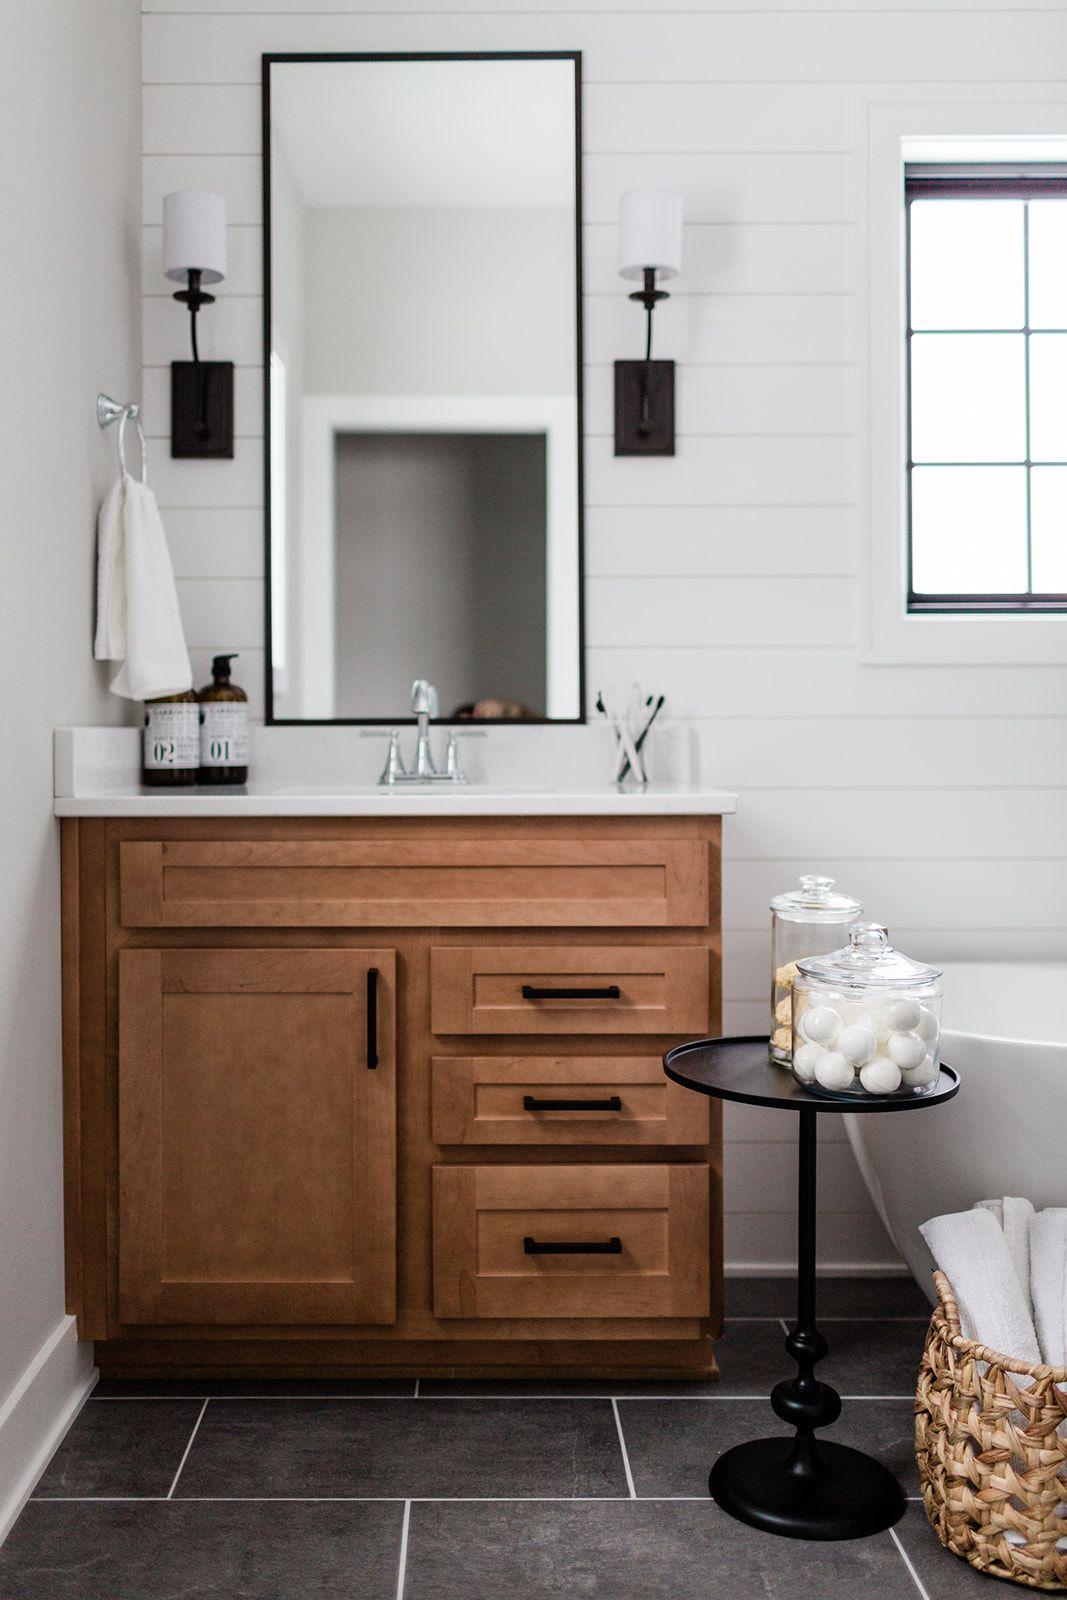 Transitional Style Bath Vanity Lights In Antique Bronze Pop In White Modern Bathroom Design Modern Bathroom Design Transitional Style Bathroom Design